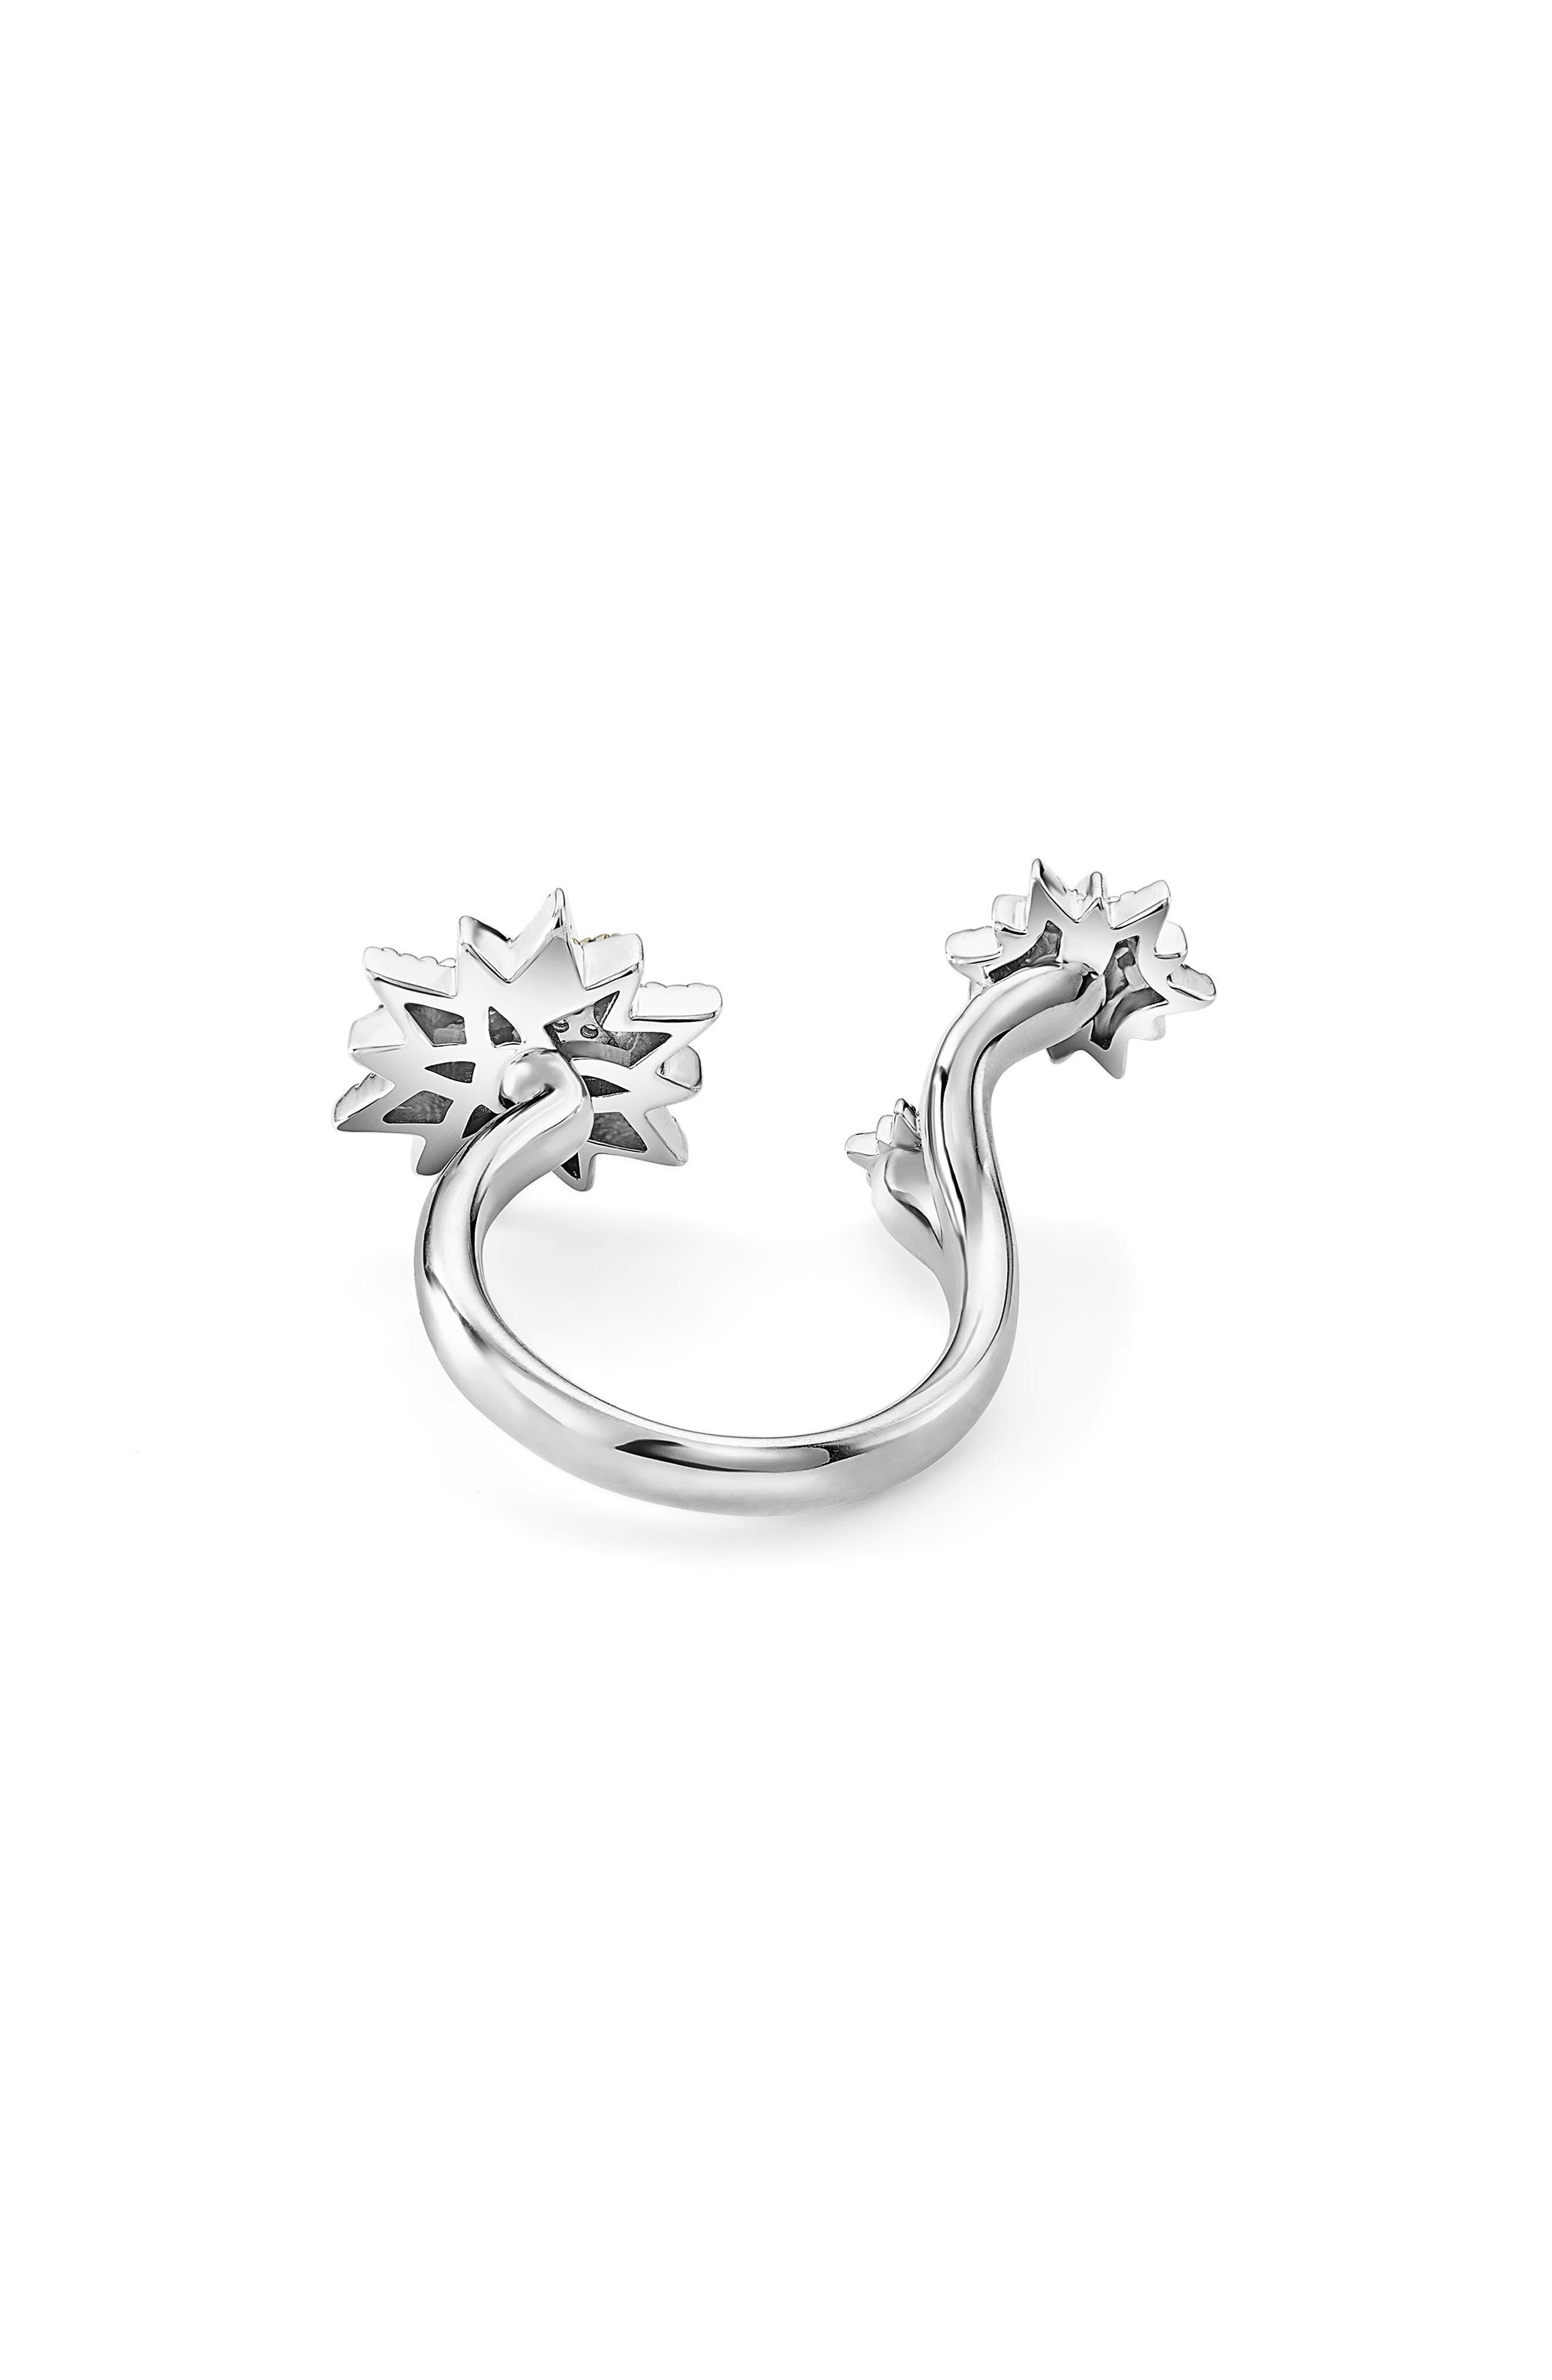 North Star Diamond Ring,                             Alternate thumbnail 3, color,                             DIAMOND